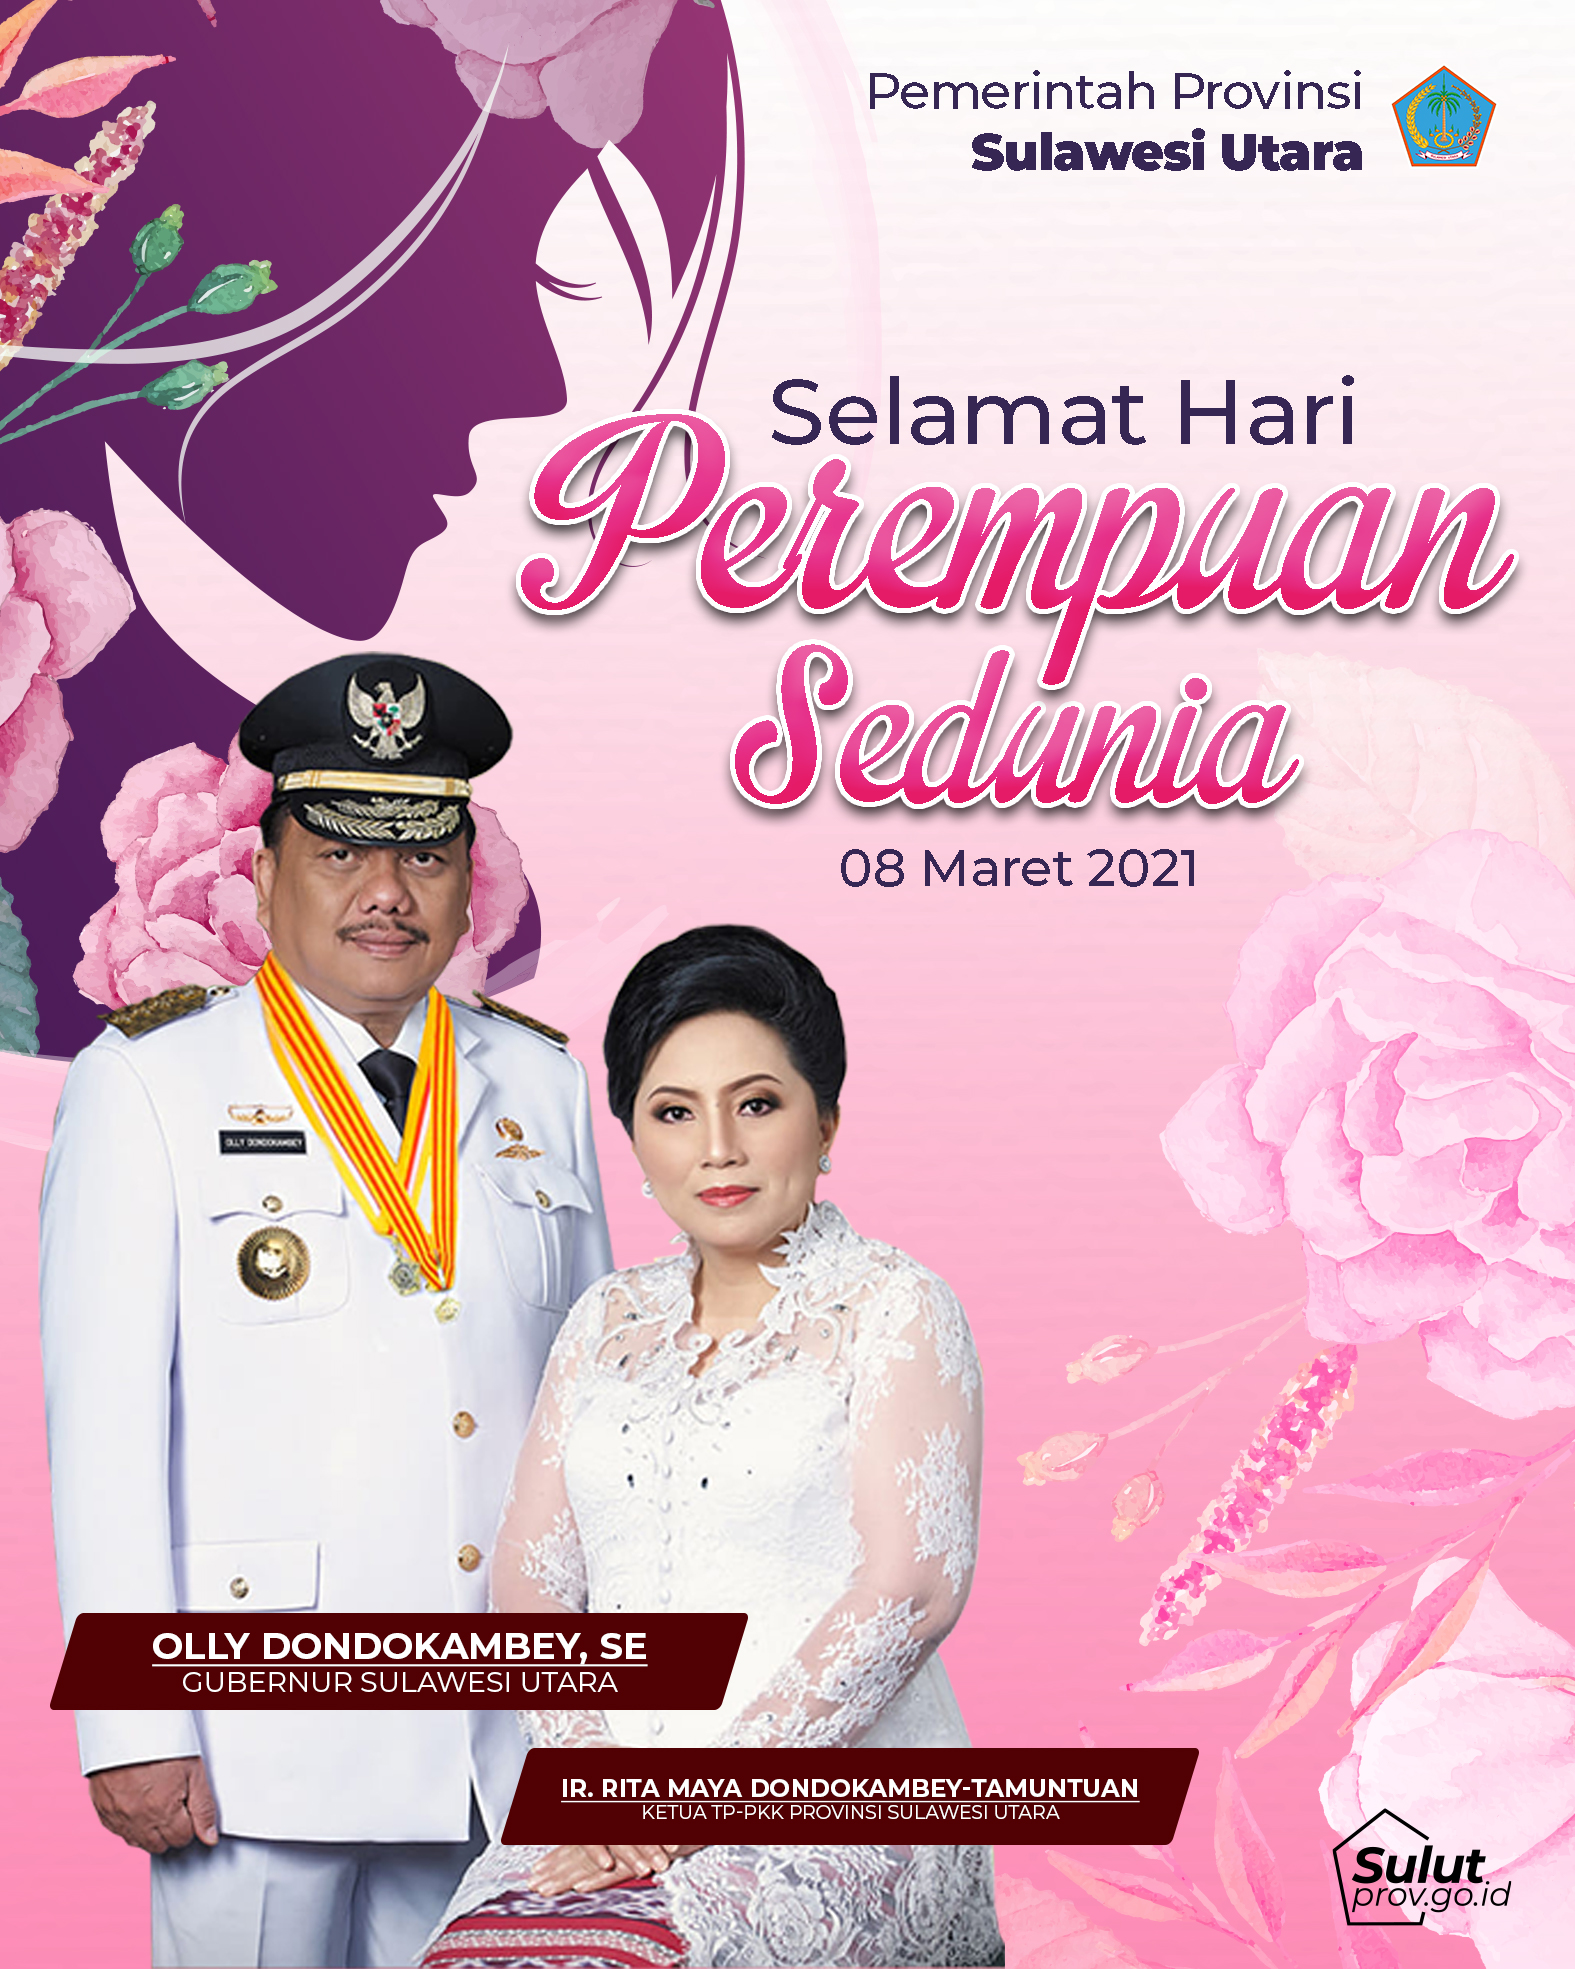 Selamat Hari Perempuan Sedunia 08 Maret 2021